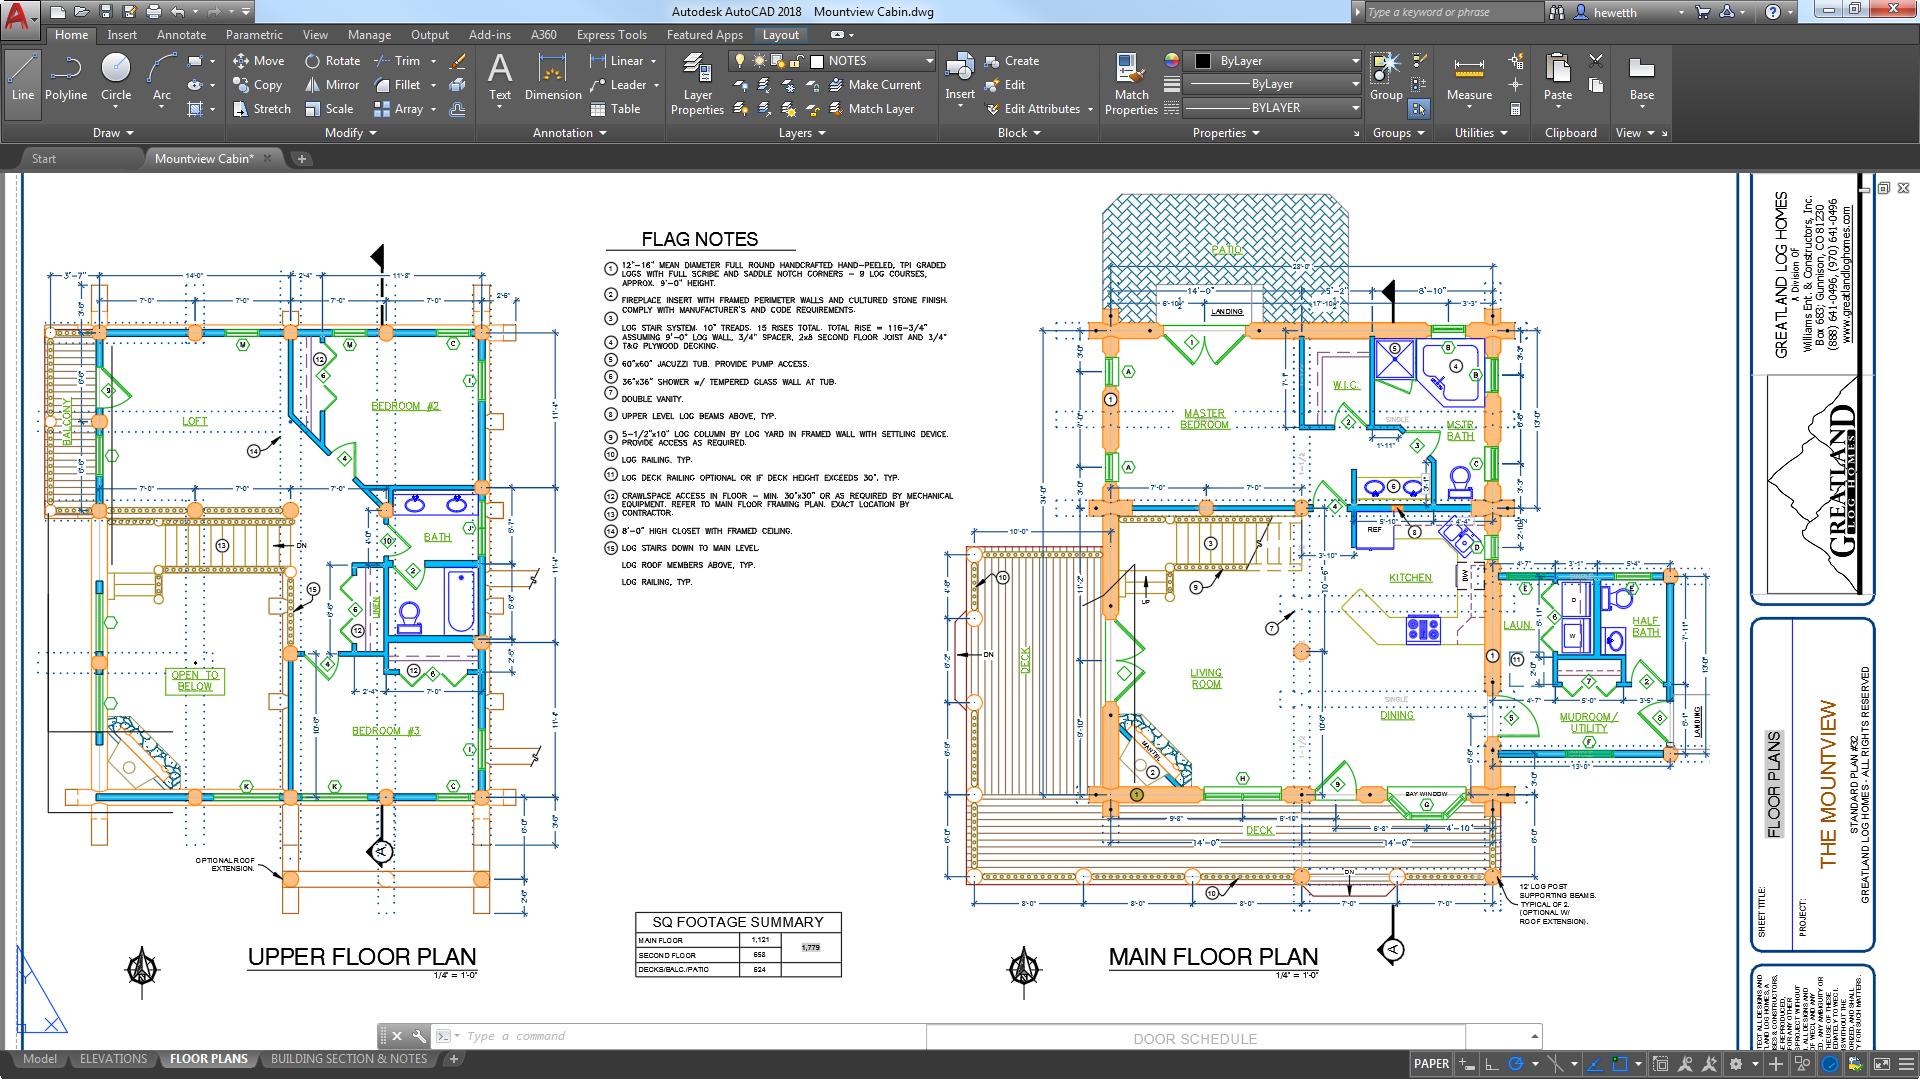 Process Flow Diagram Using Autocad Schematics Dwg Cad A U201csoon To Beu201d Common Skill Set Leah Ochs Sap Plant Maintenance